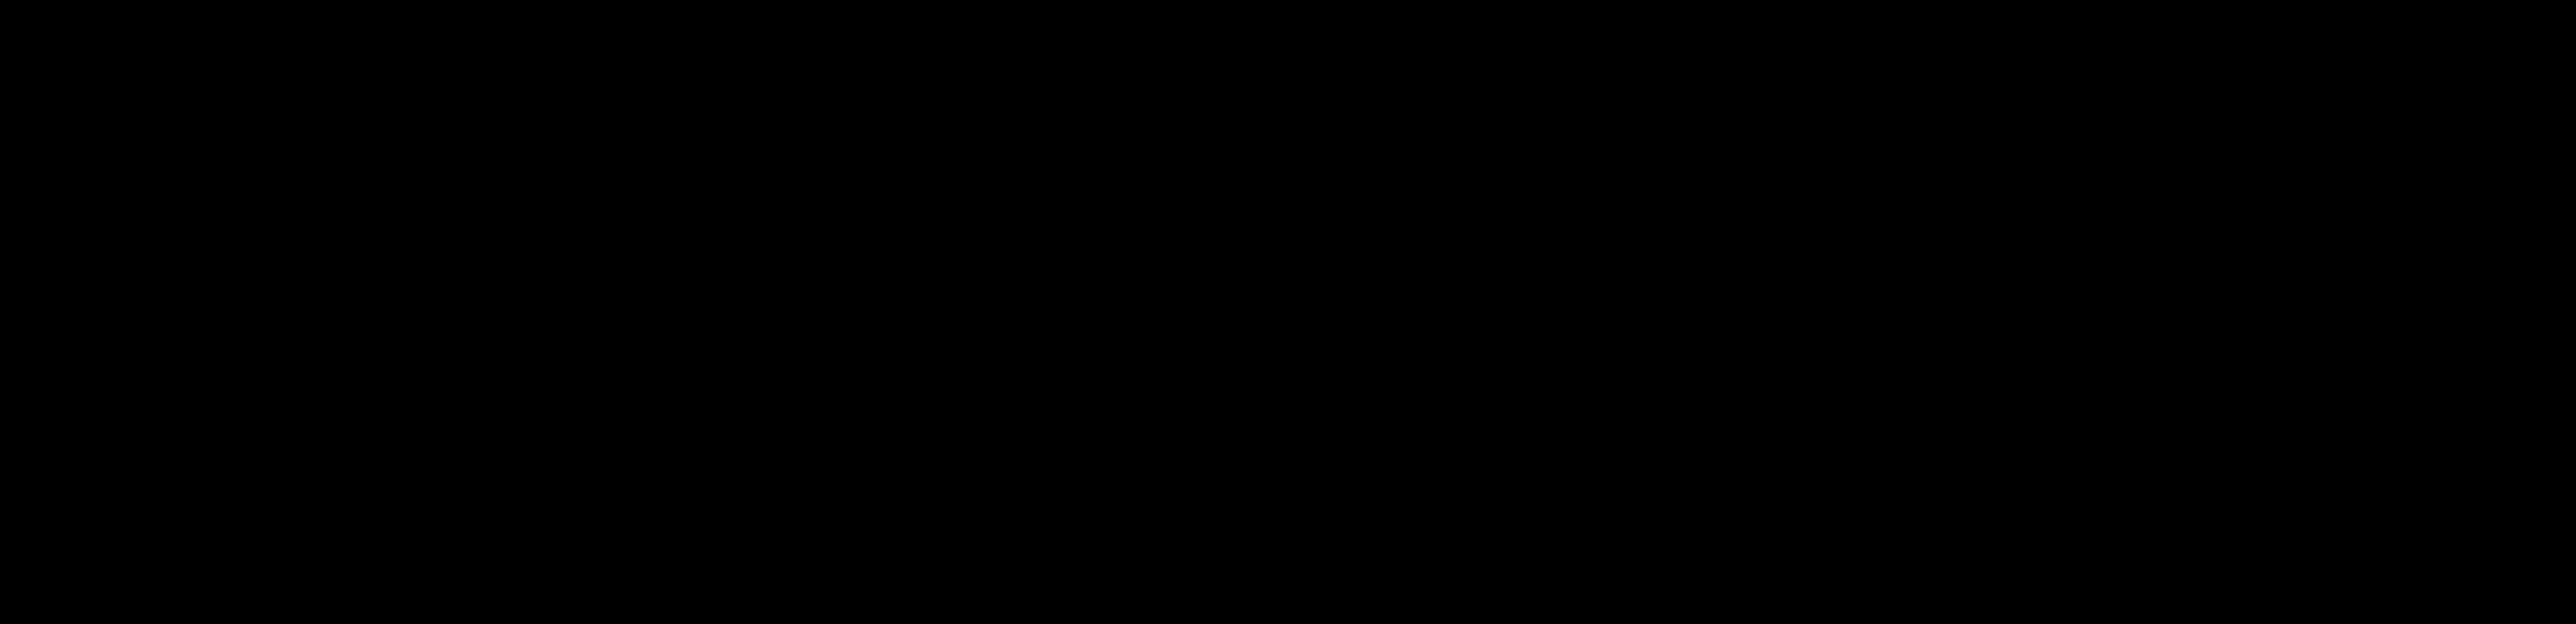 rene2412.de_Logo (2)